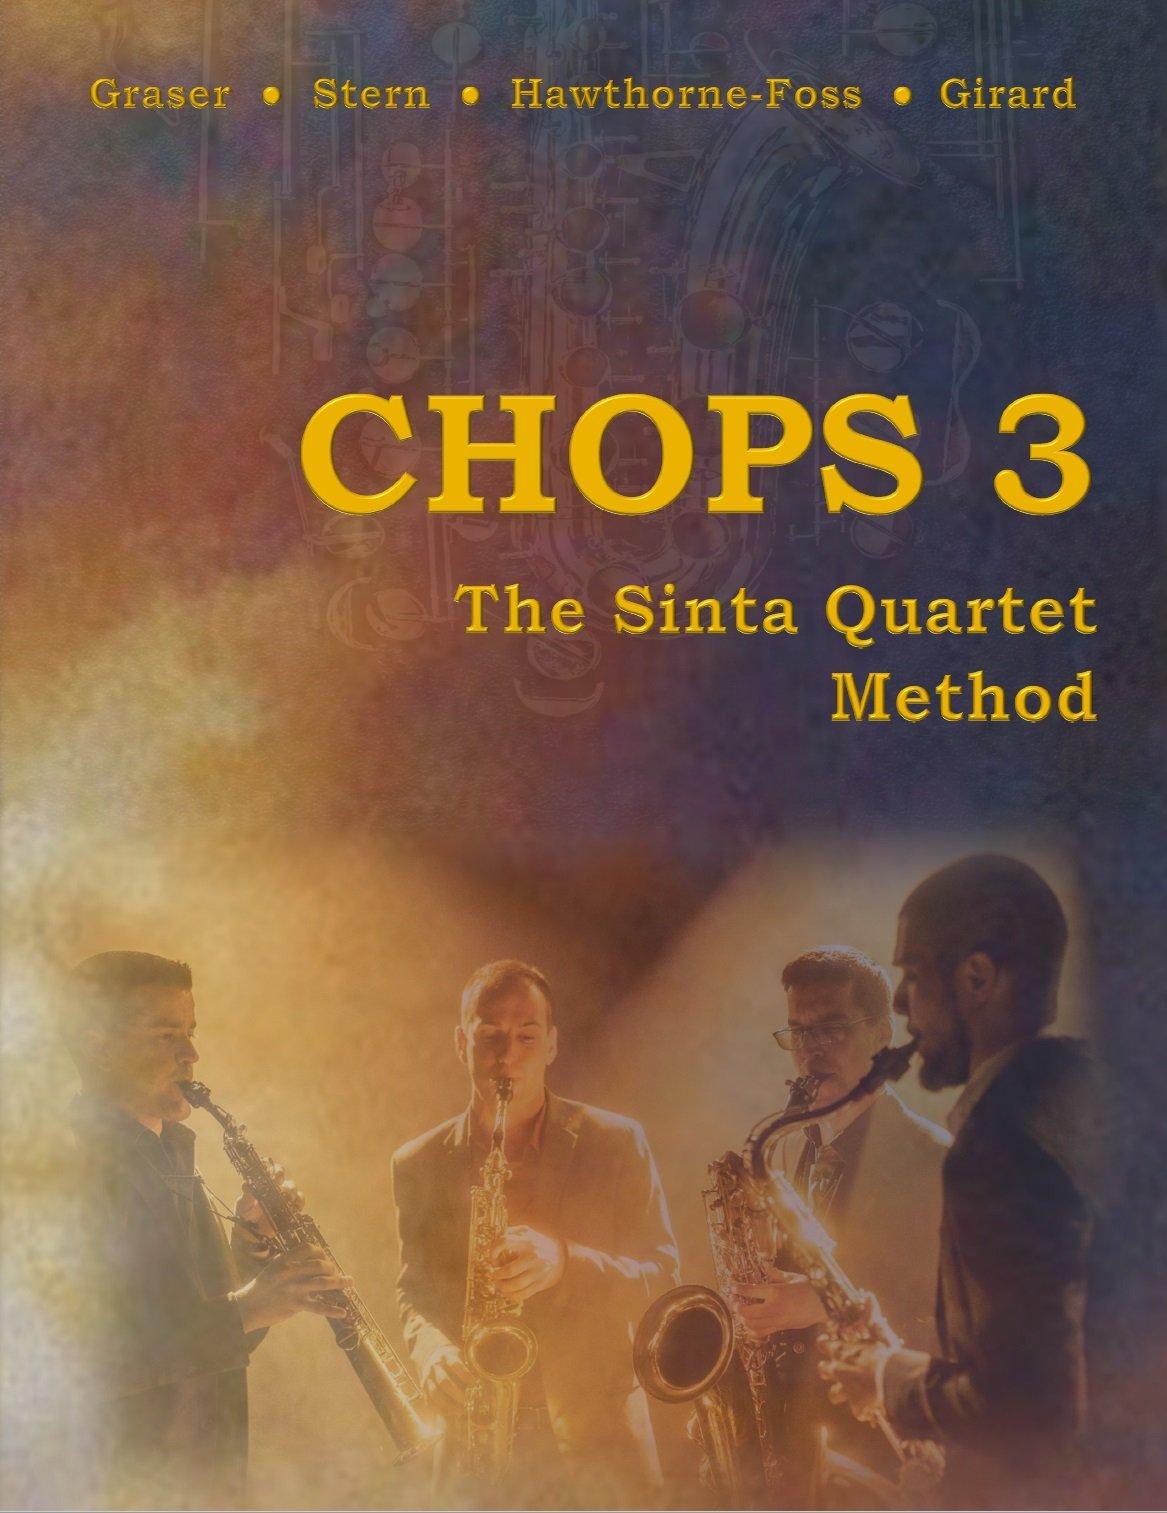 Graser, Dan: CHOPS 3: The Sinta Quartet Method